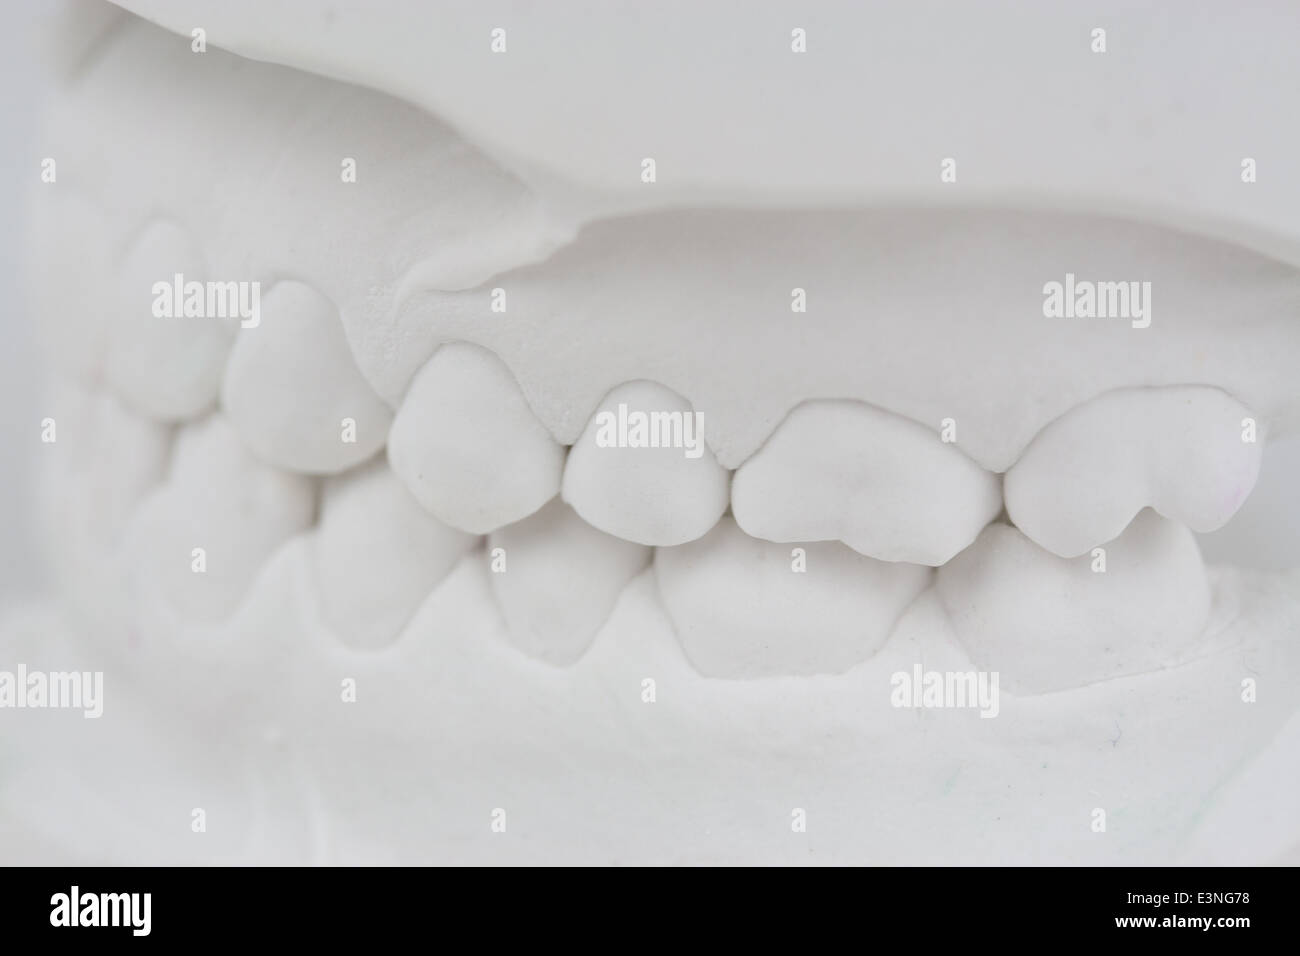 Backenzähne Gipsabdruck - Stock Image